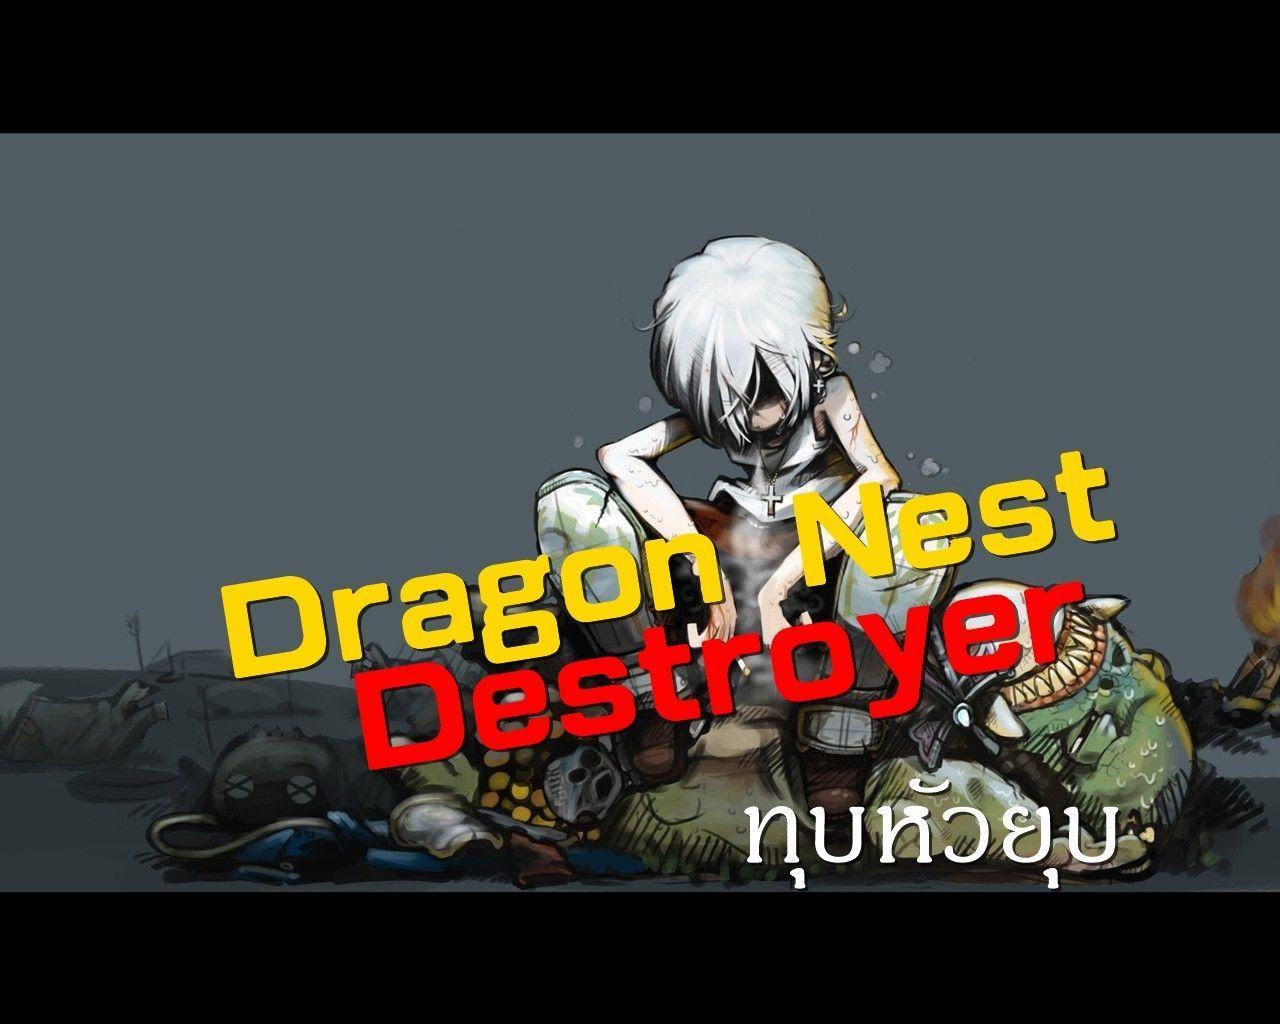 Dragon Nest Destroyer Wallpapers - Wallpaper Cave